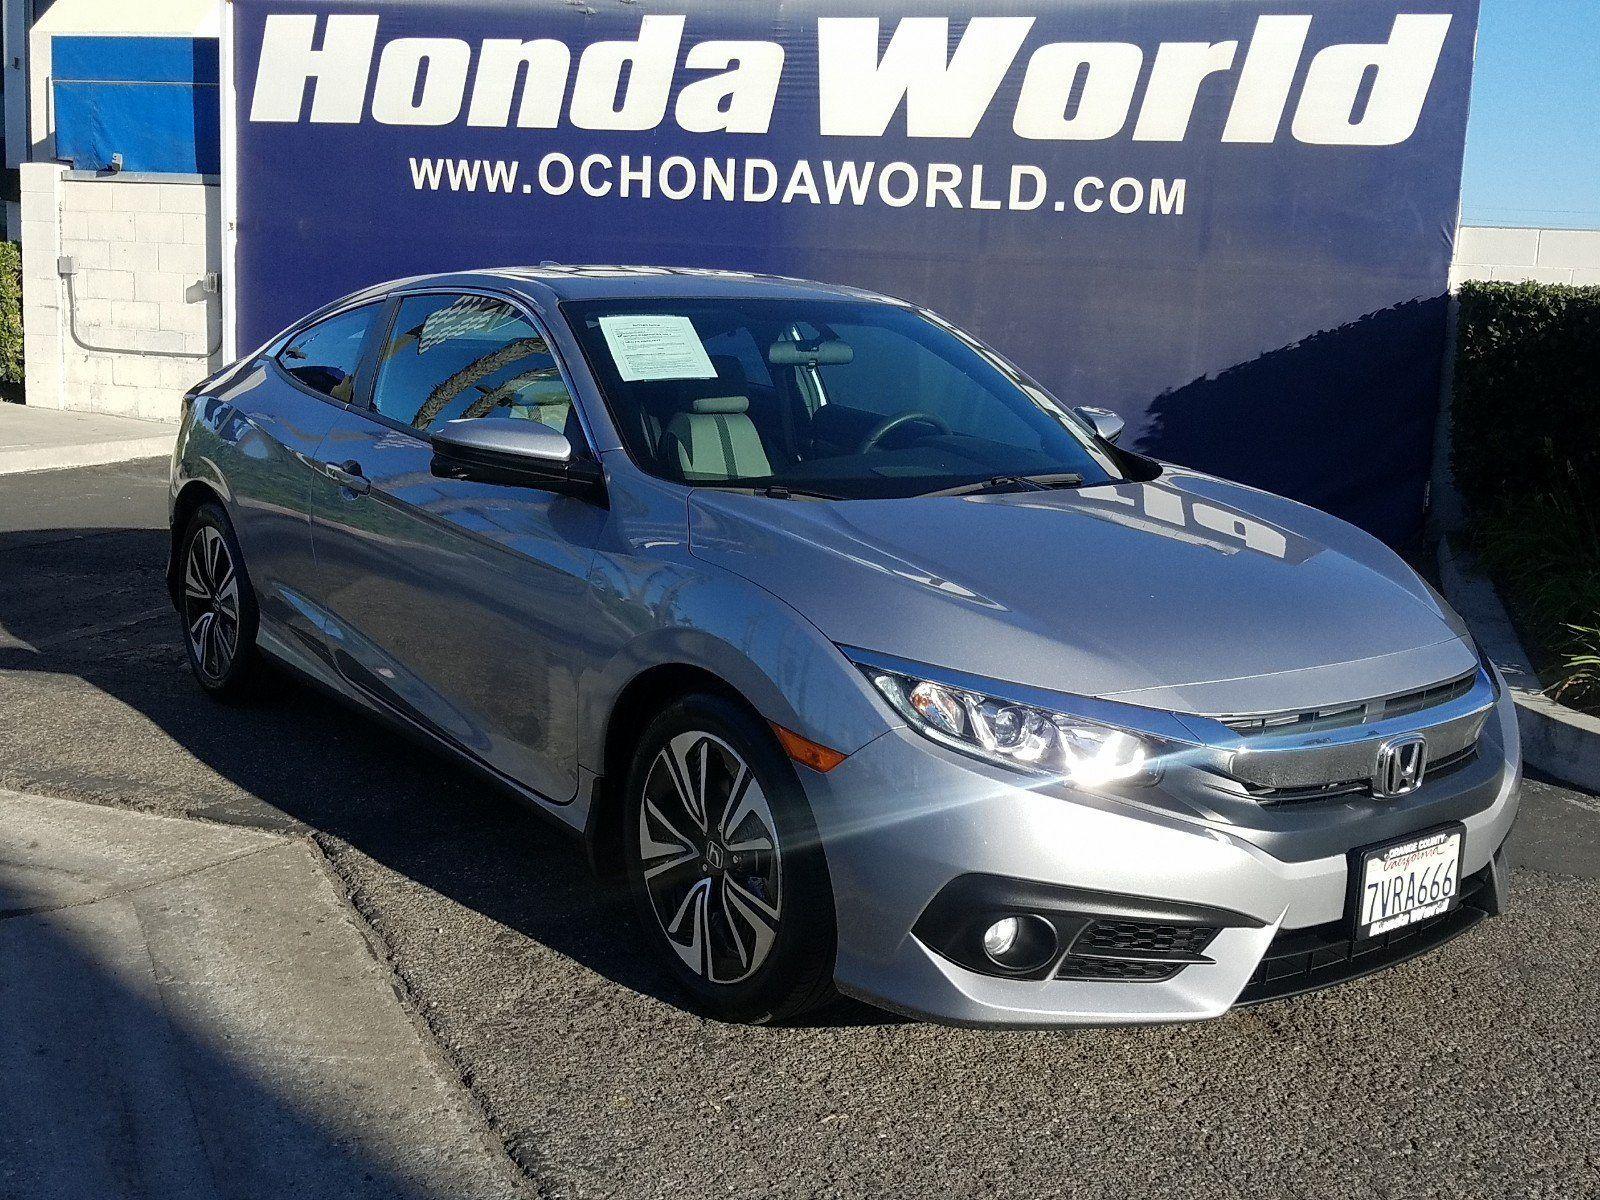 2021 Honda Civic Specs in 2020 Honda civic, Honda civic